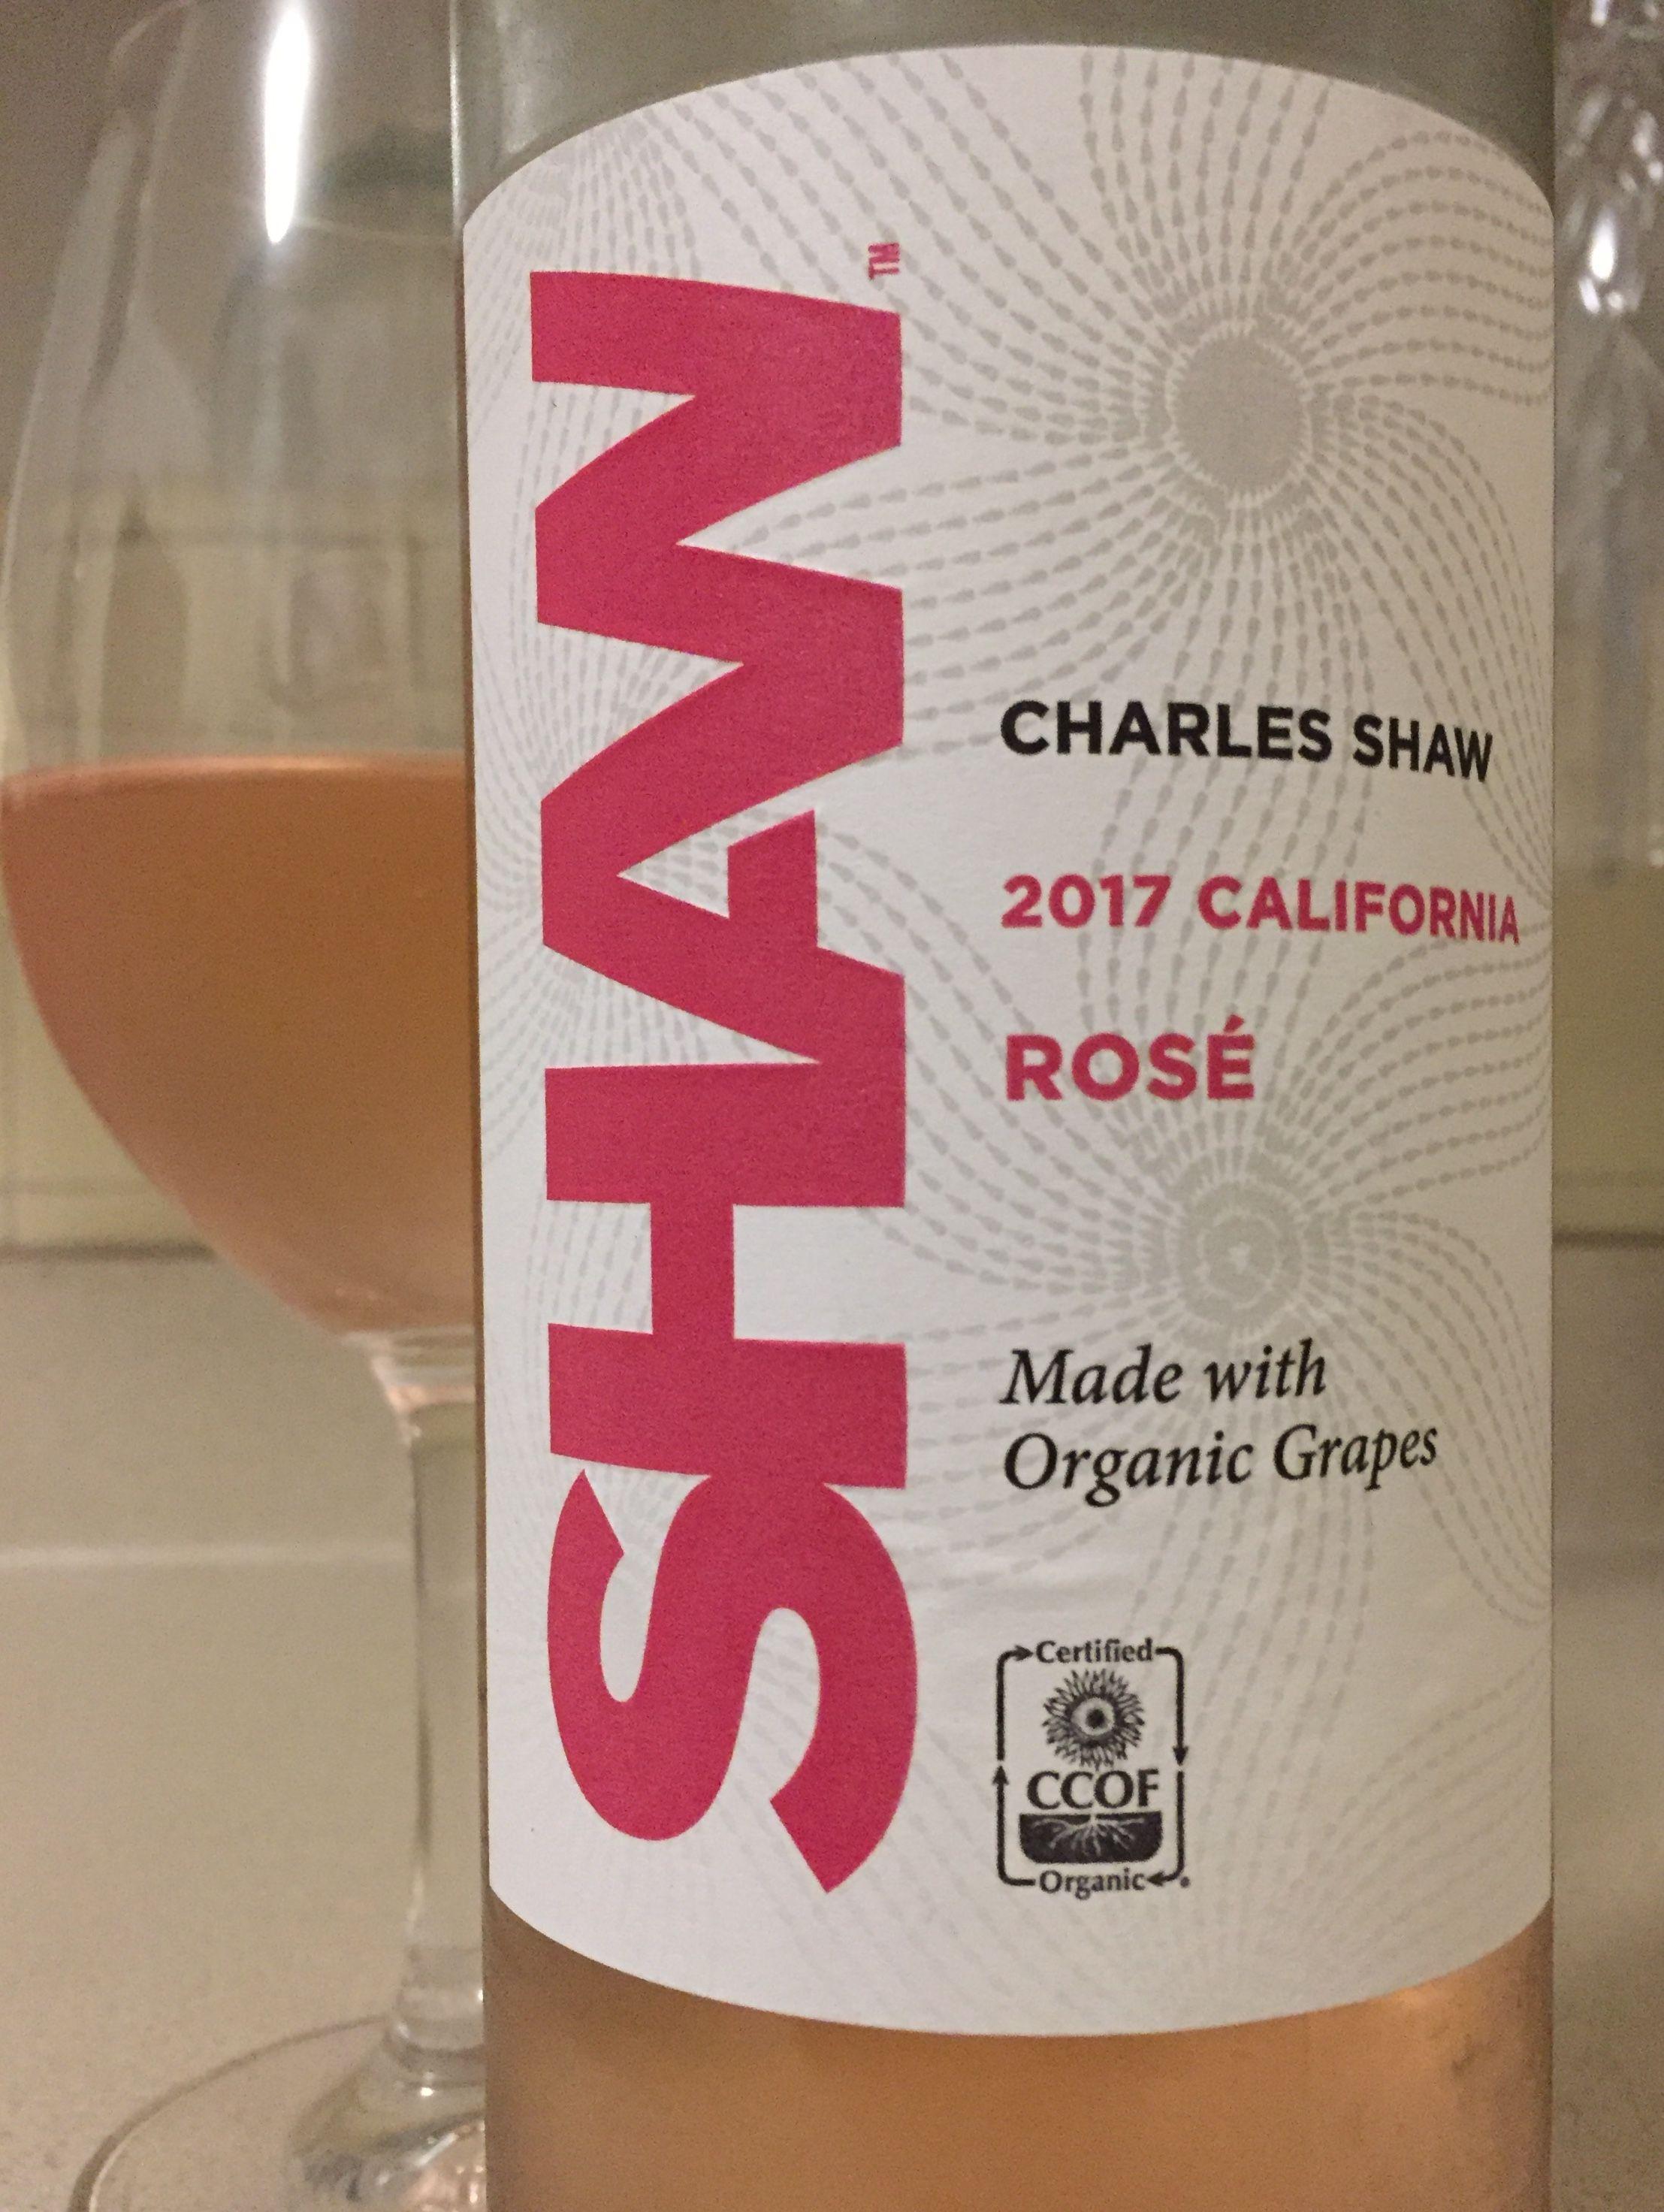 Charles Shaw 2017 California Rose Made With Organic Grapes Organic Grapes Grapes Bottle